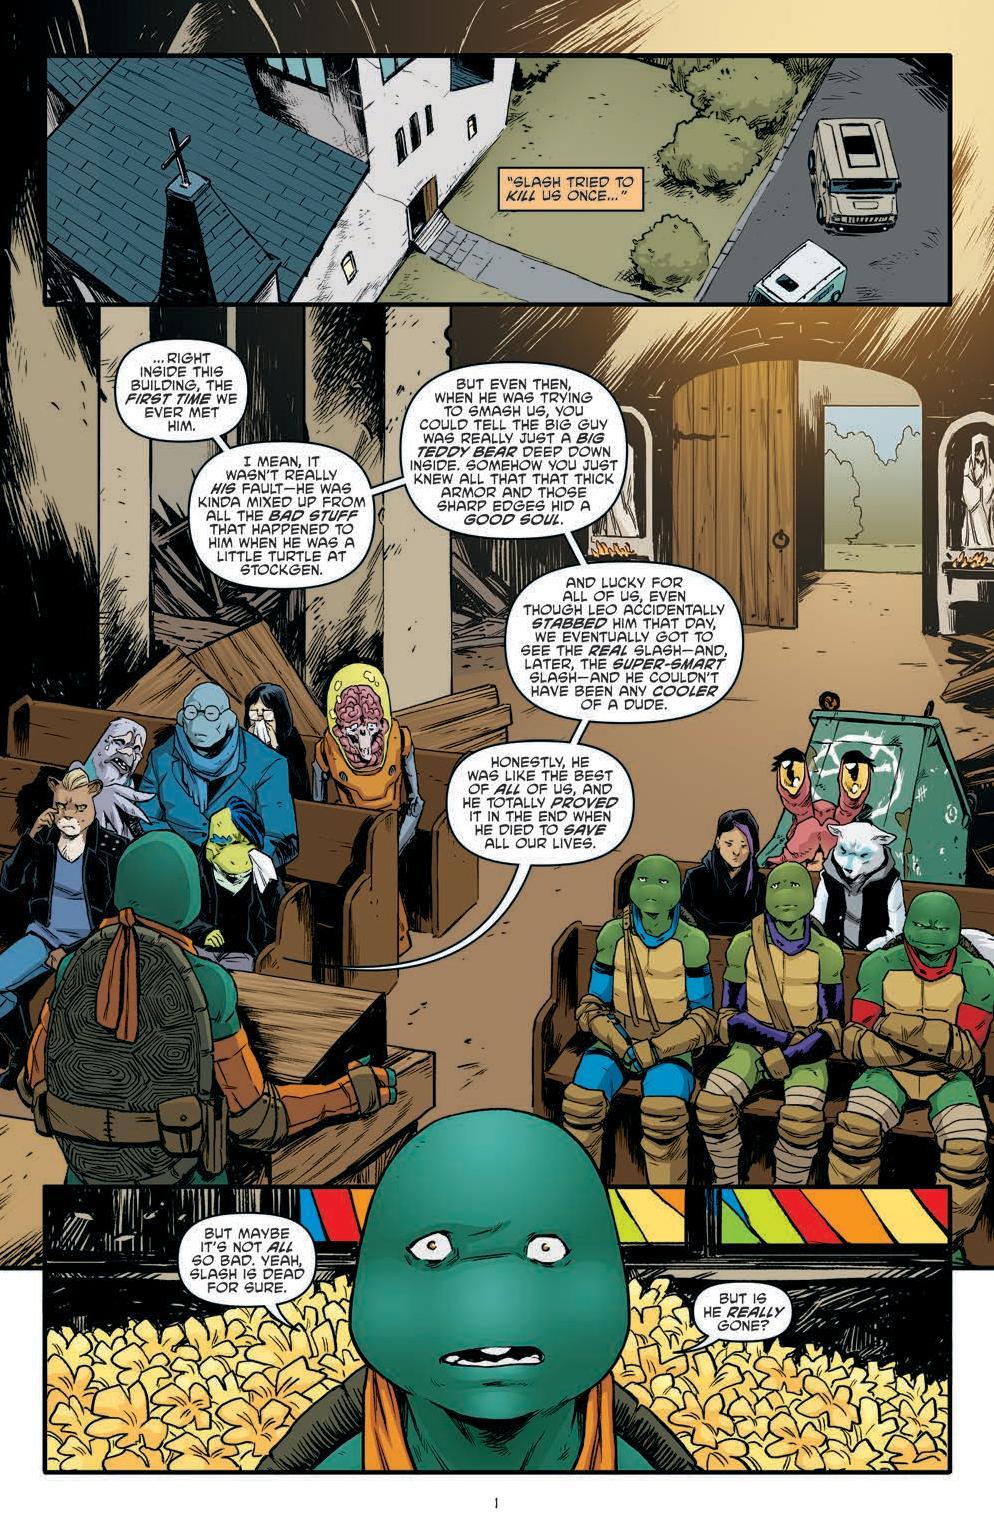 Review – Teenage Mutant Ninja Turtles #90 (IDW Publishing